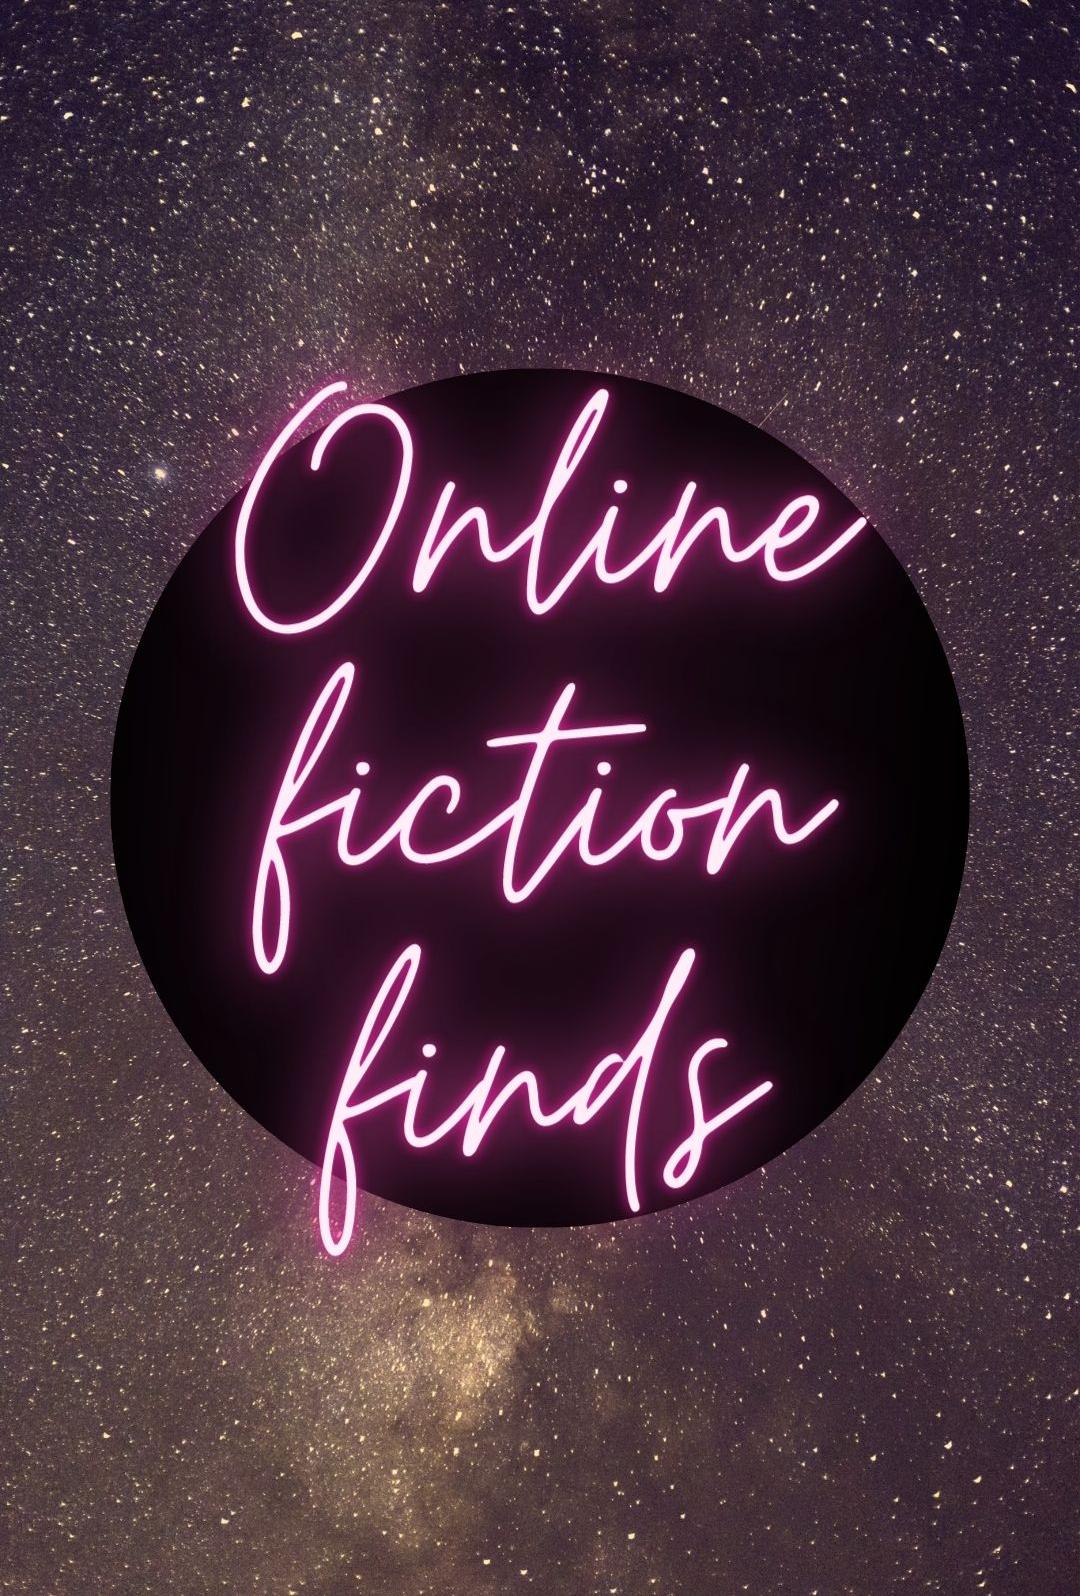 Online fiction finds